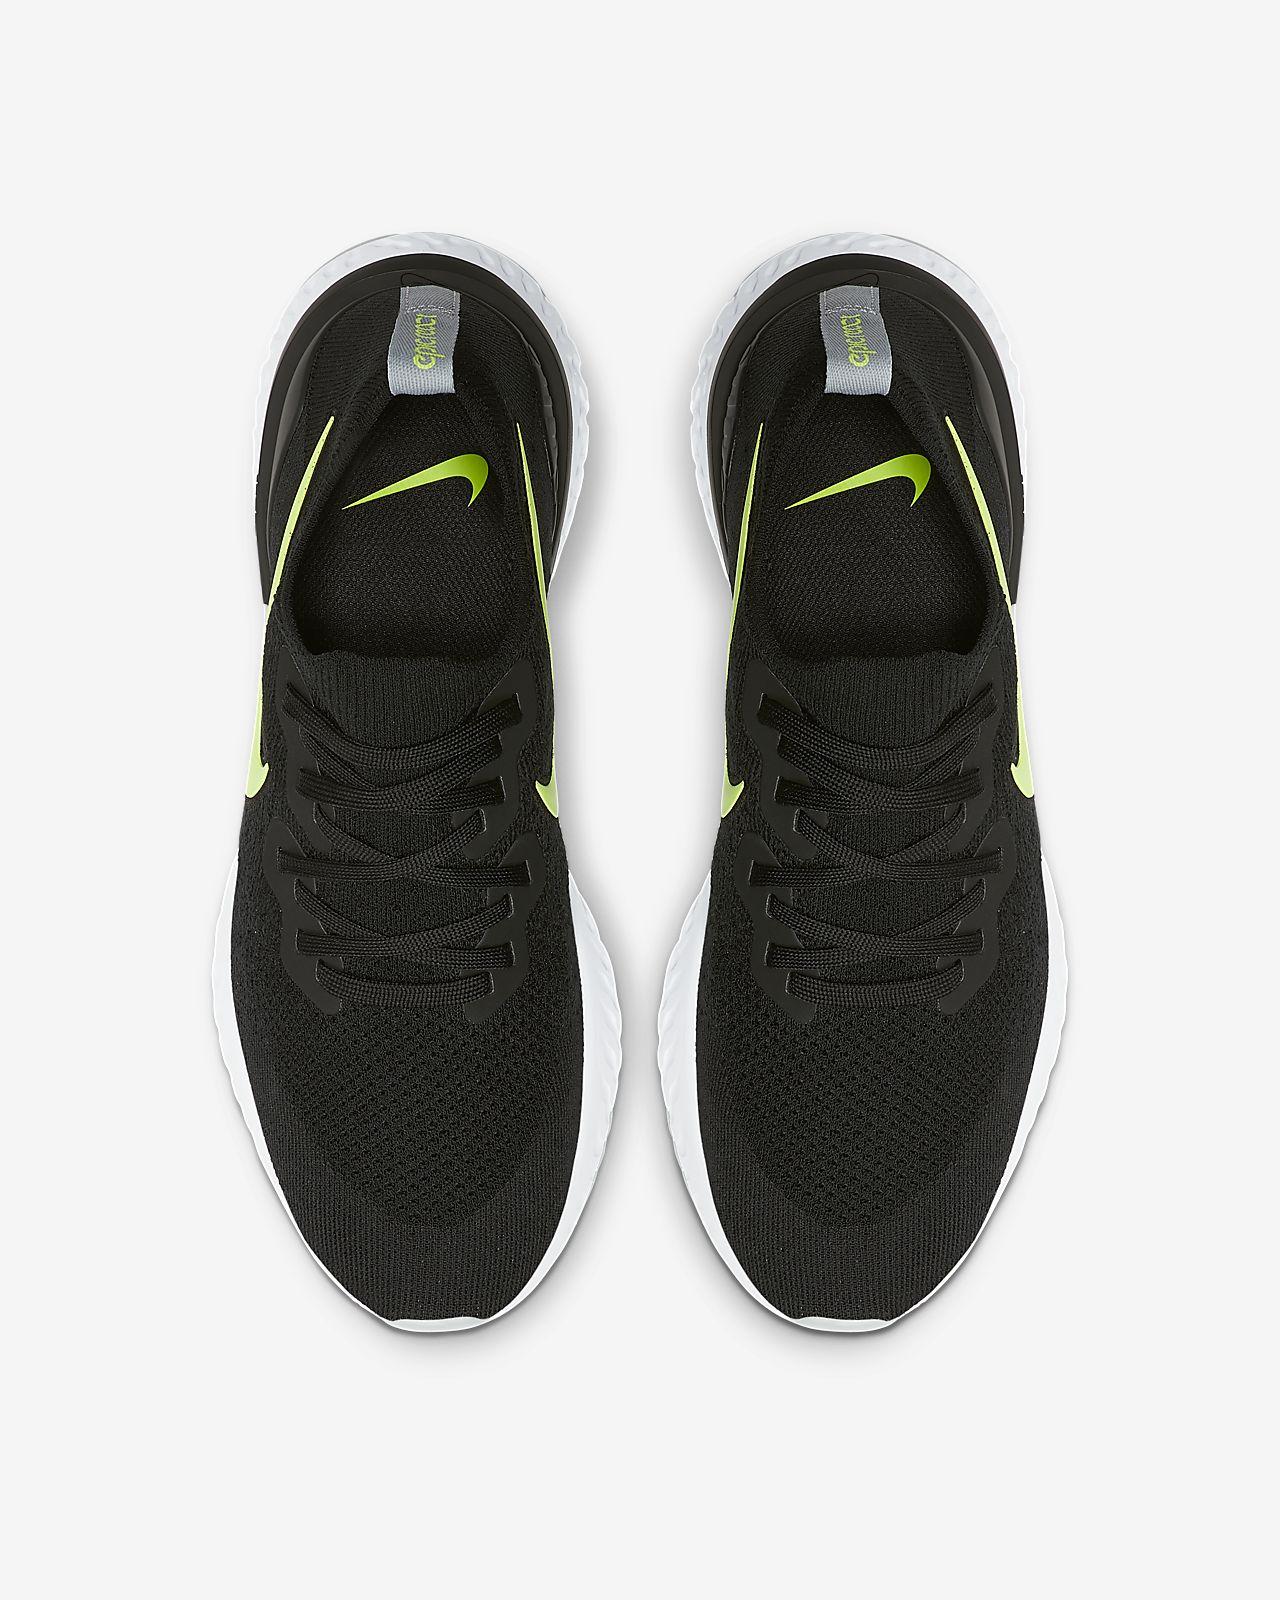 6667664bd41 Ανδρικό παπούτσι για τρέξιμο Nike Epic React Flyknit 2. Nike.com GR